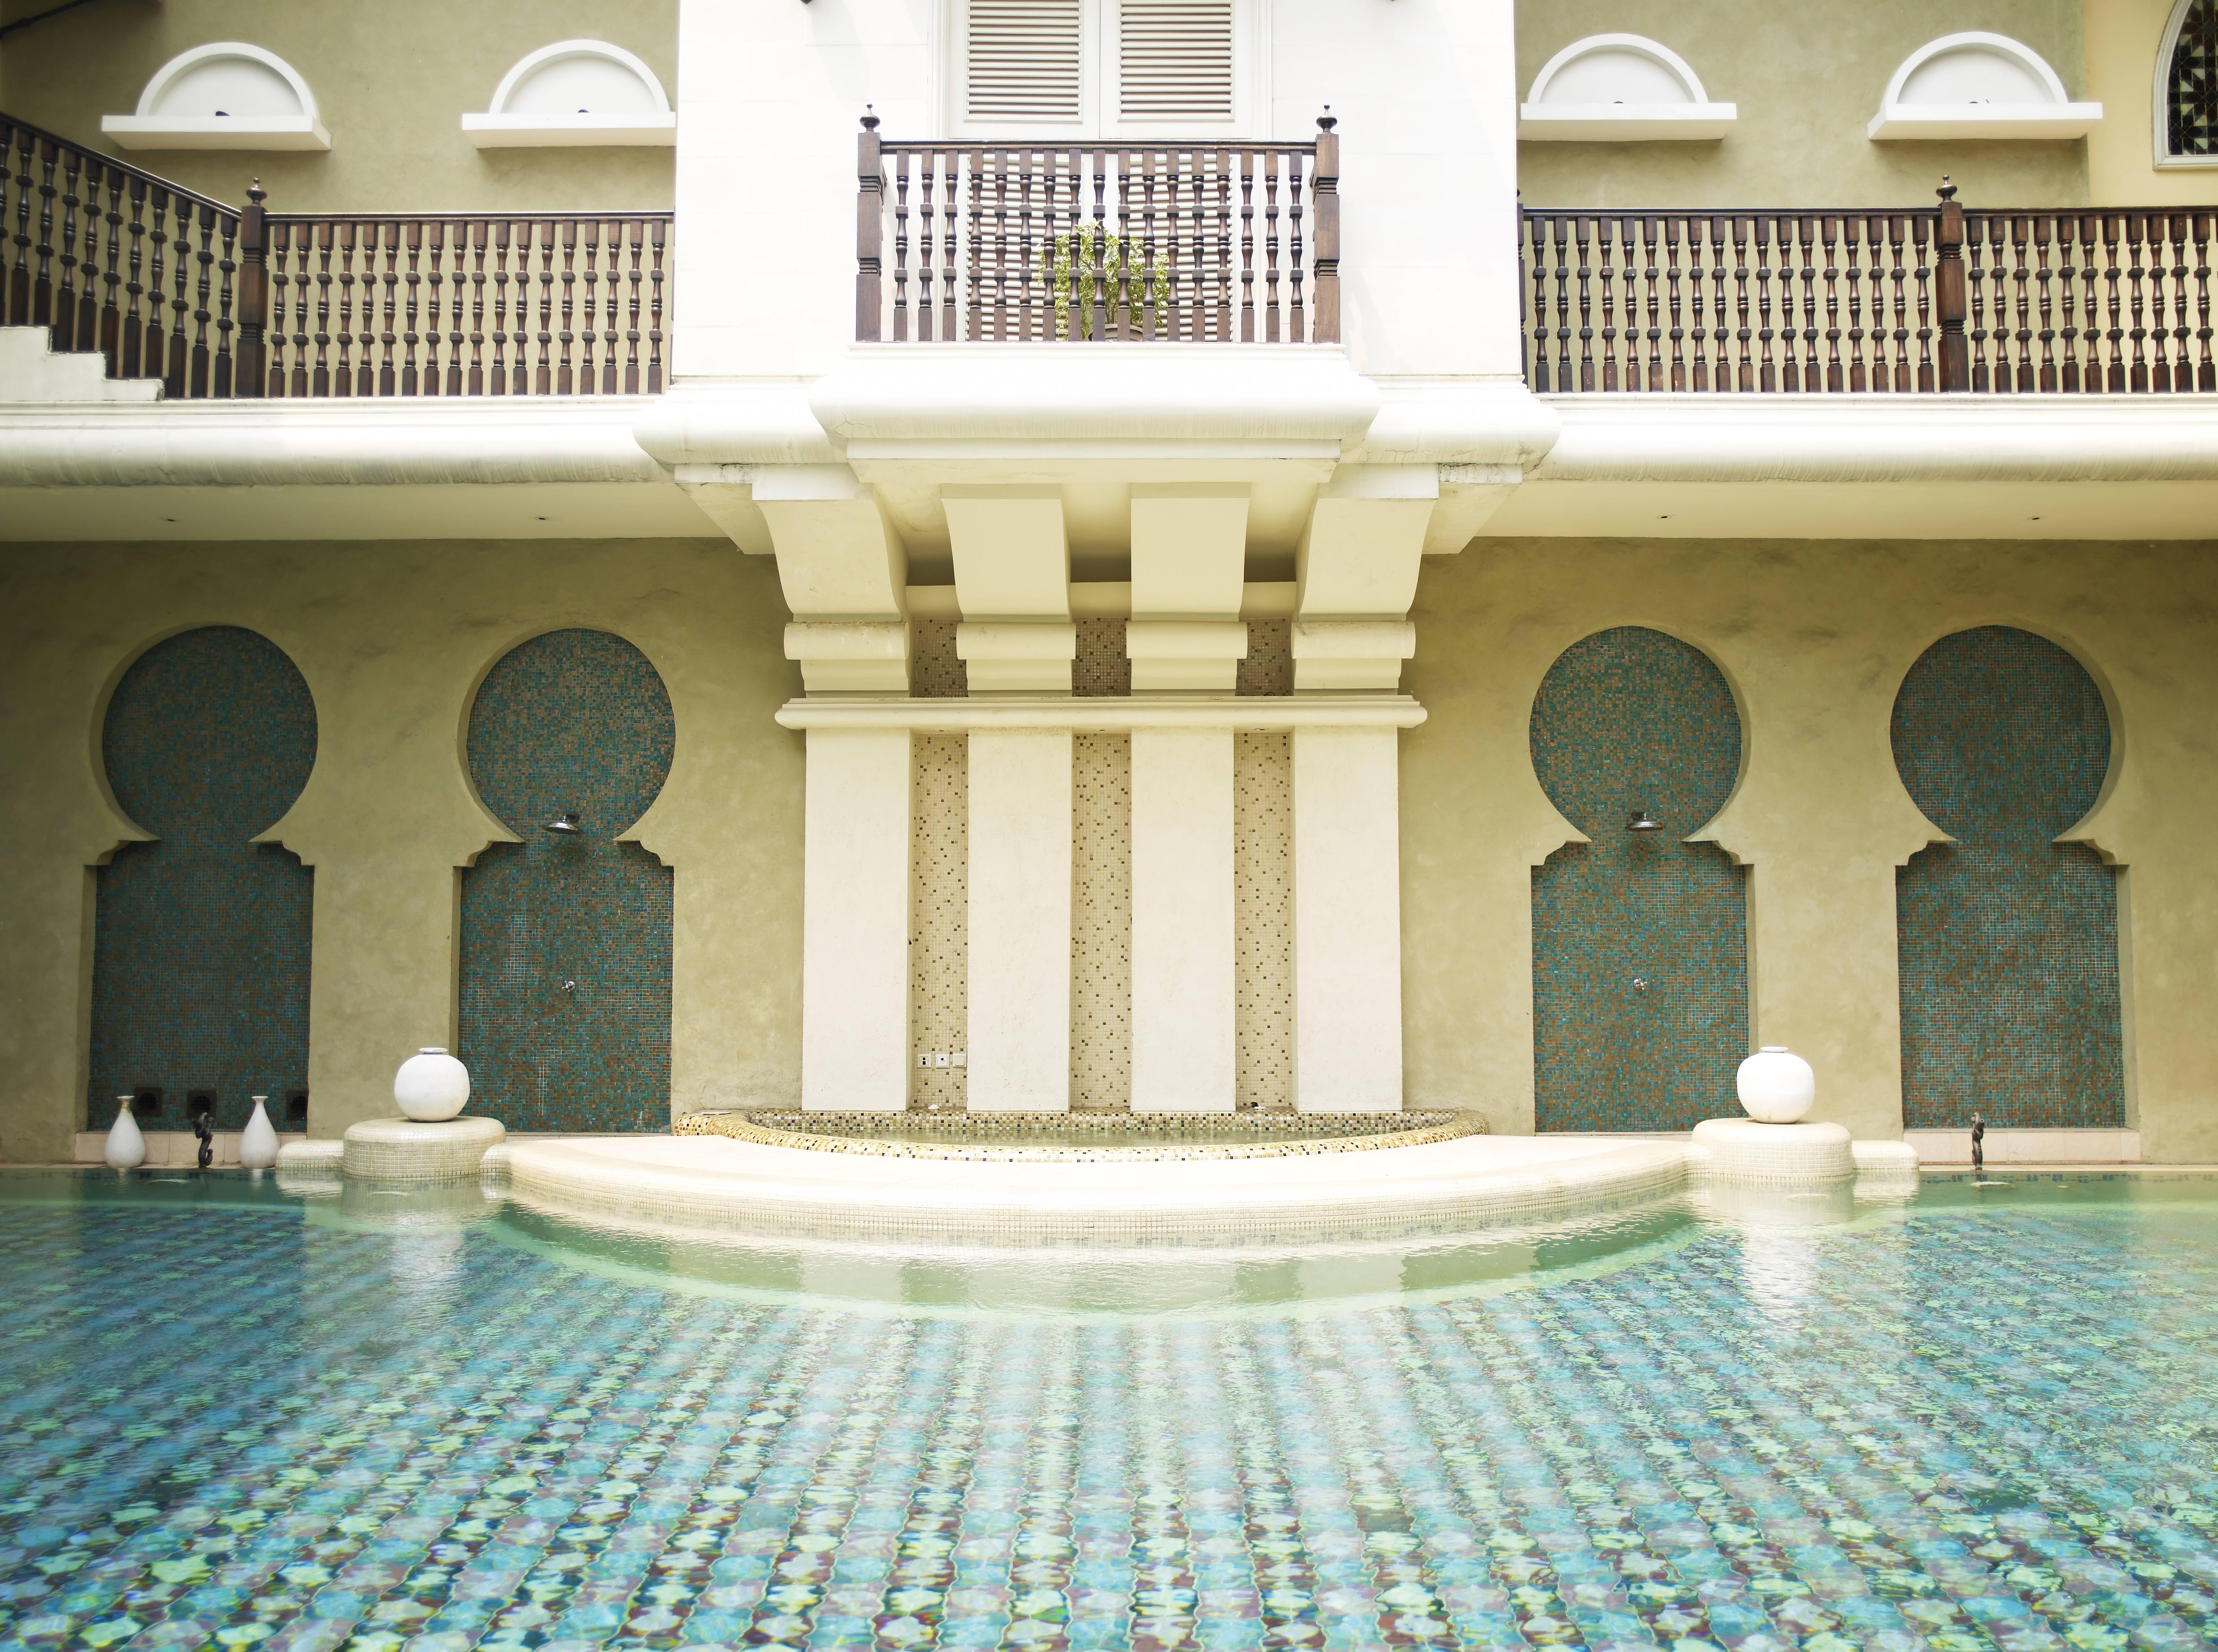 wedding-venue-jakarta-venuerific-blog-rumah-maroko-swimming-pool